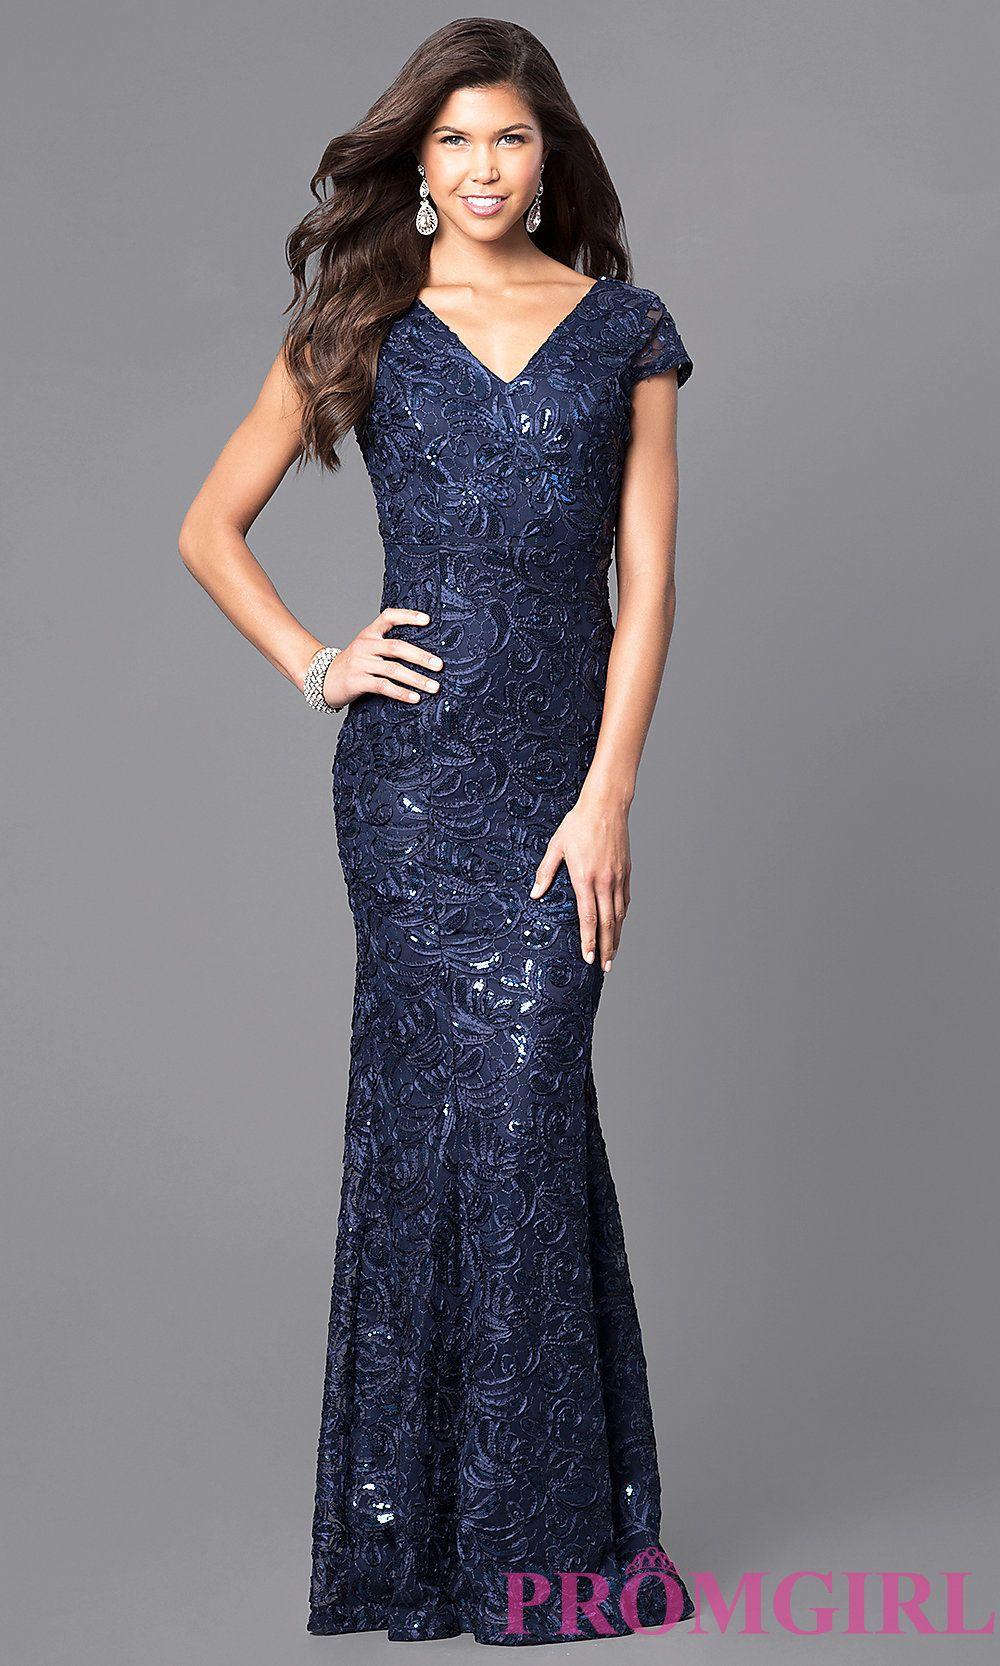 Plus Size Formal Dresses Under 100